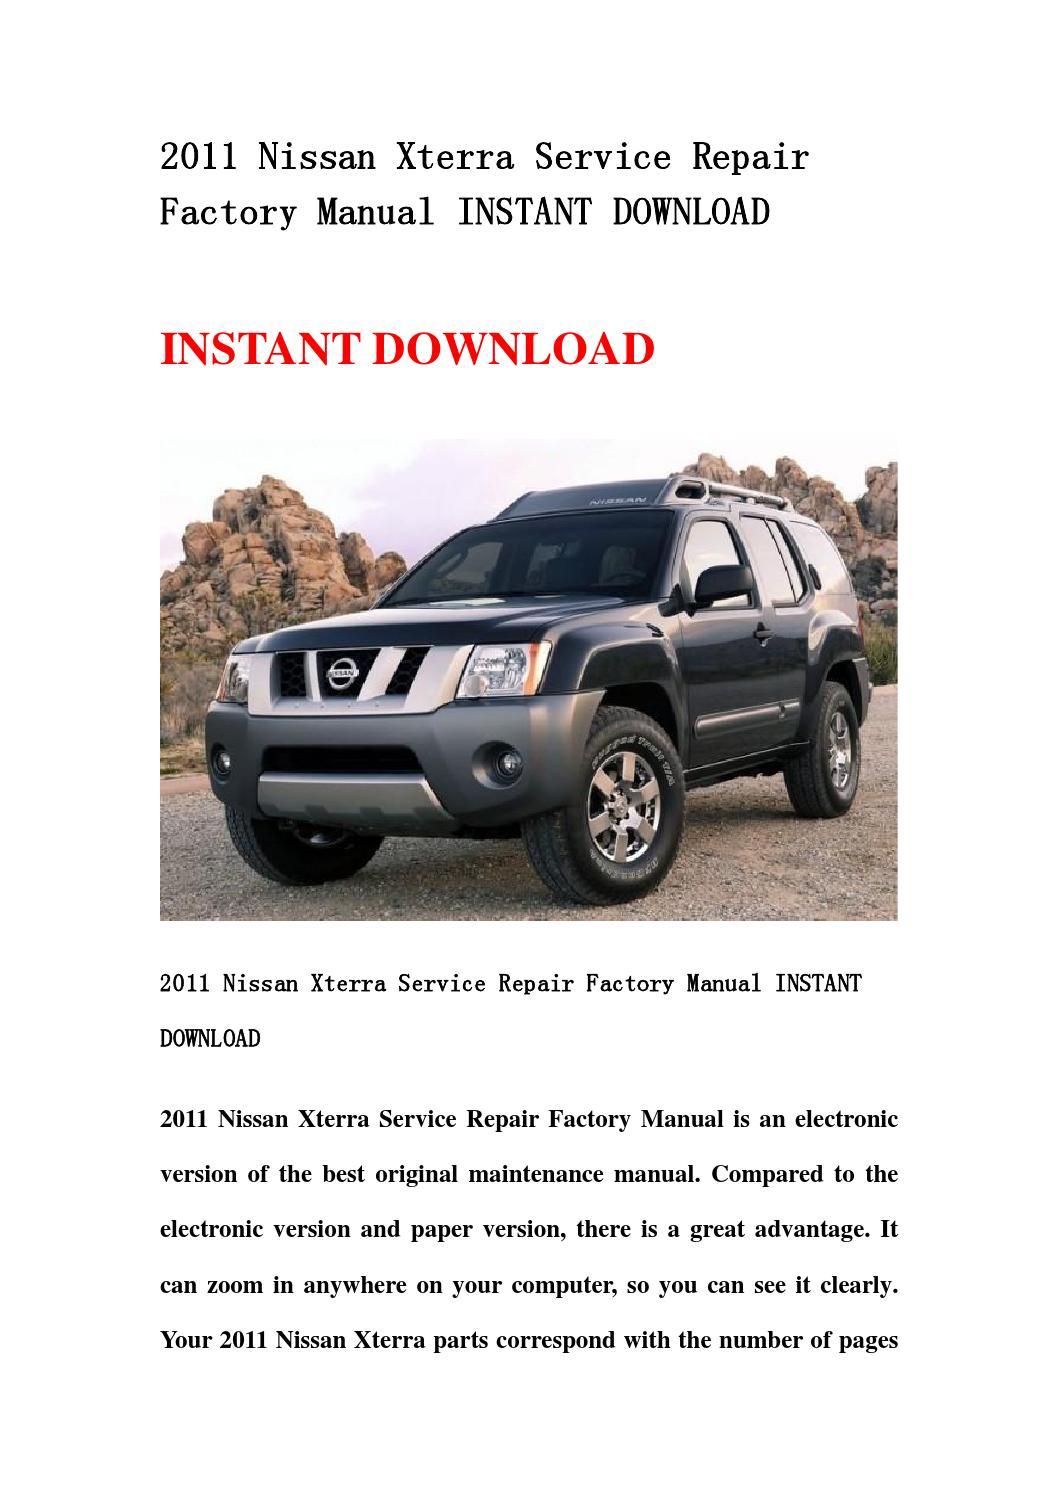 2002 nissan xterra owner's manual